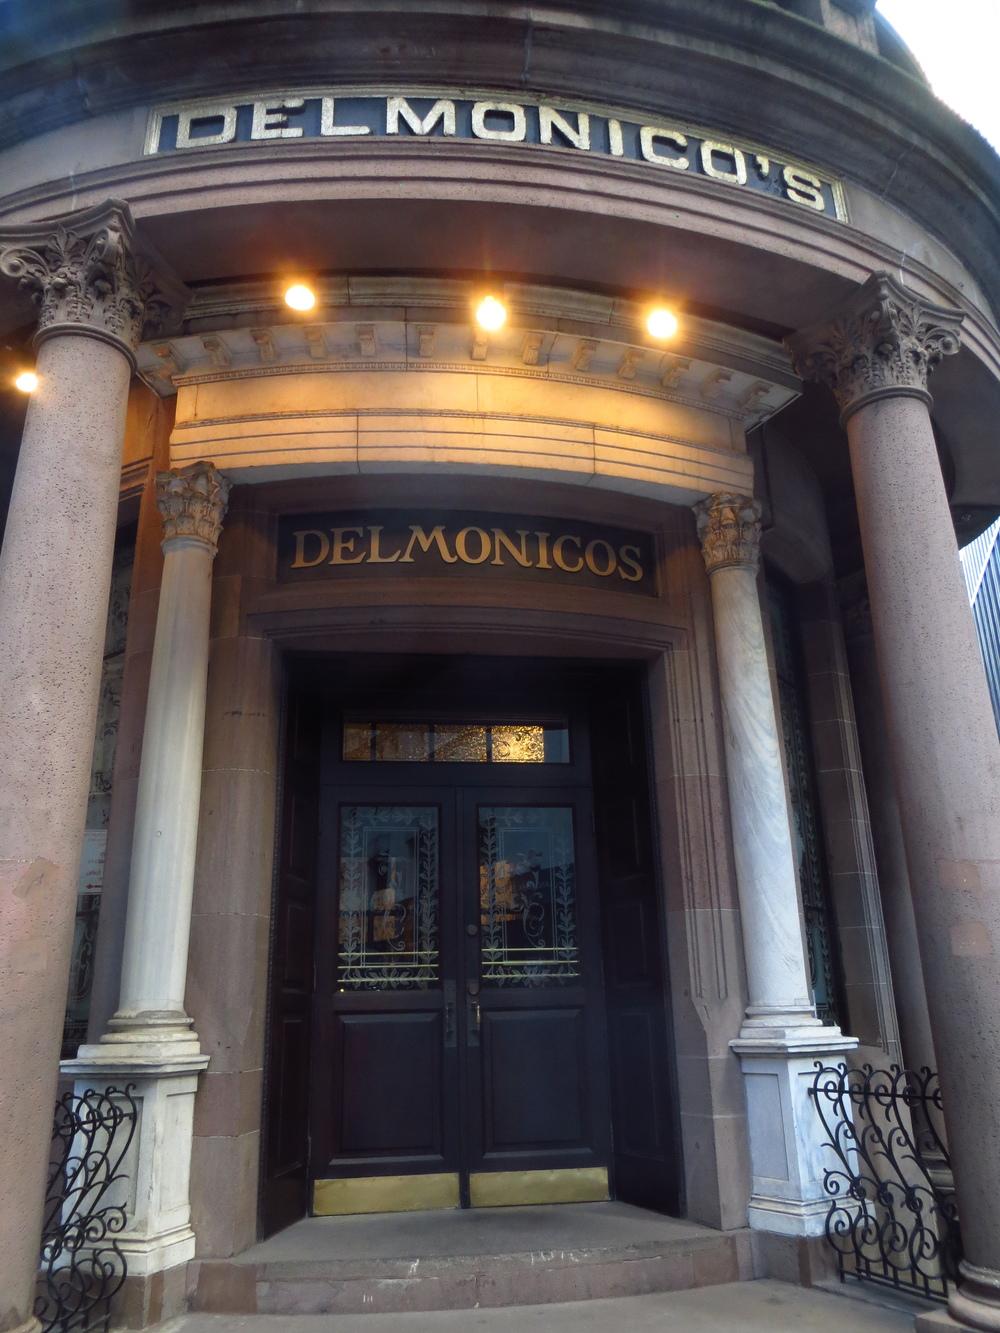 Delmonico's - America's first modern restaurant